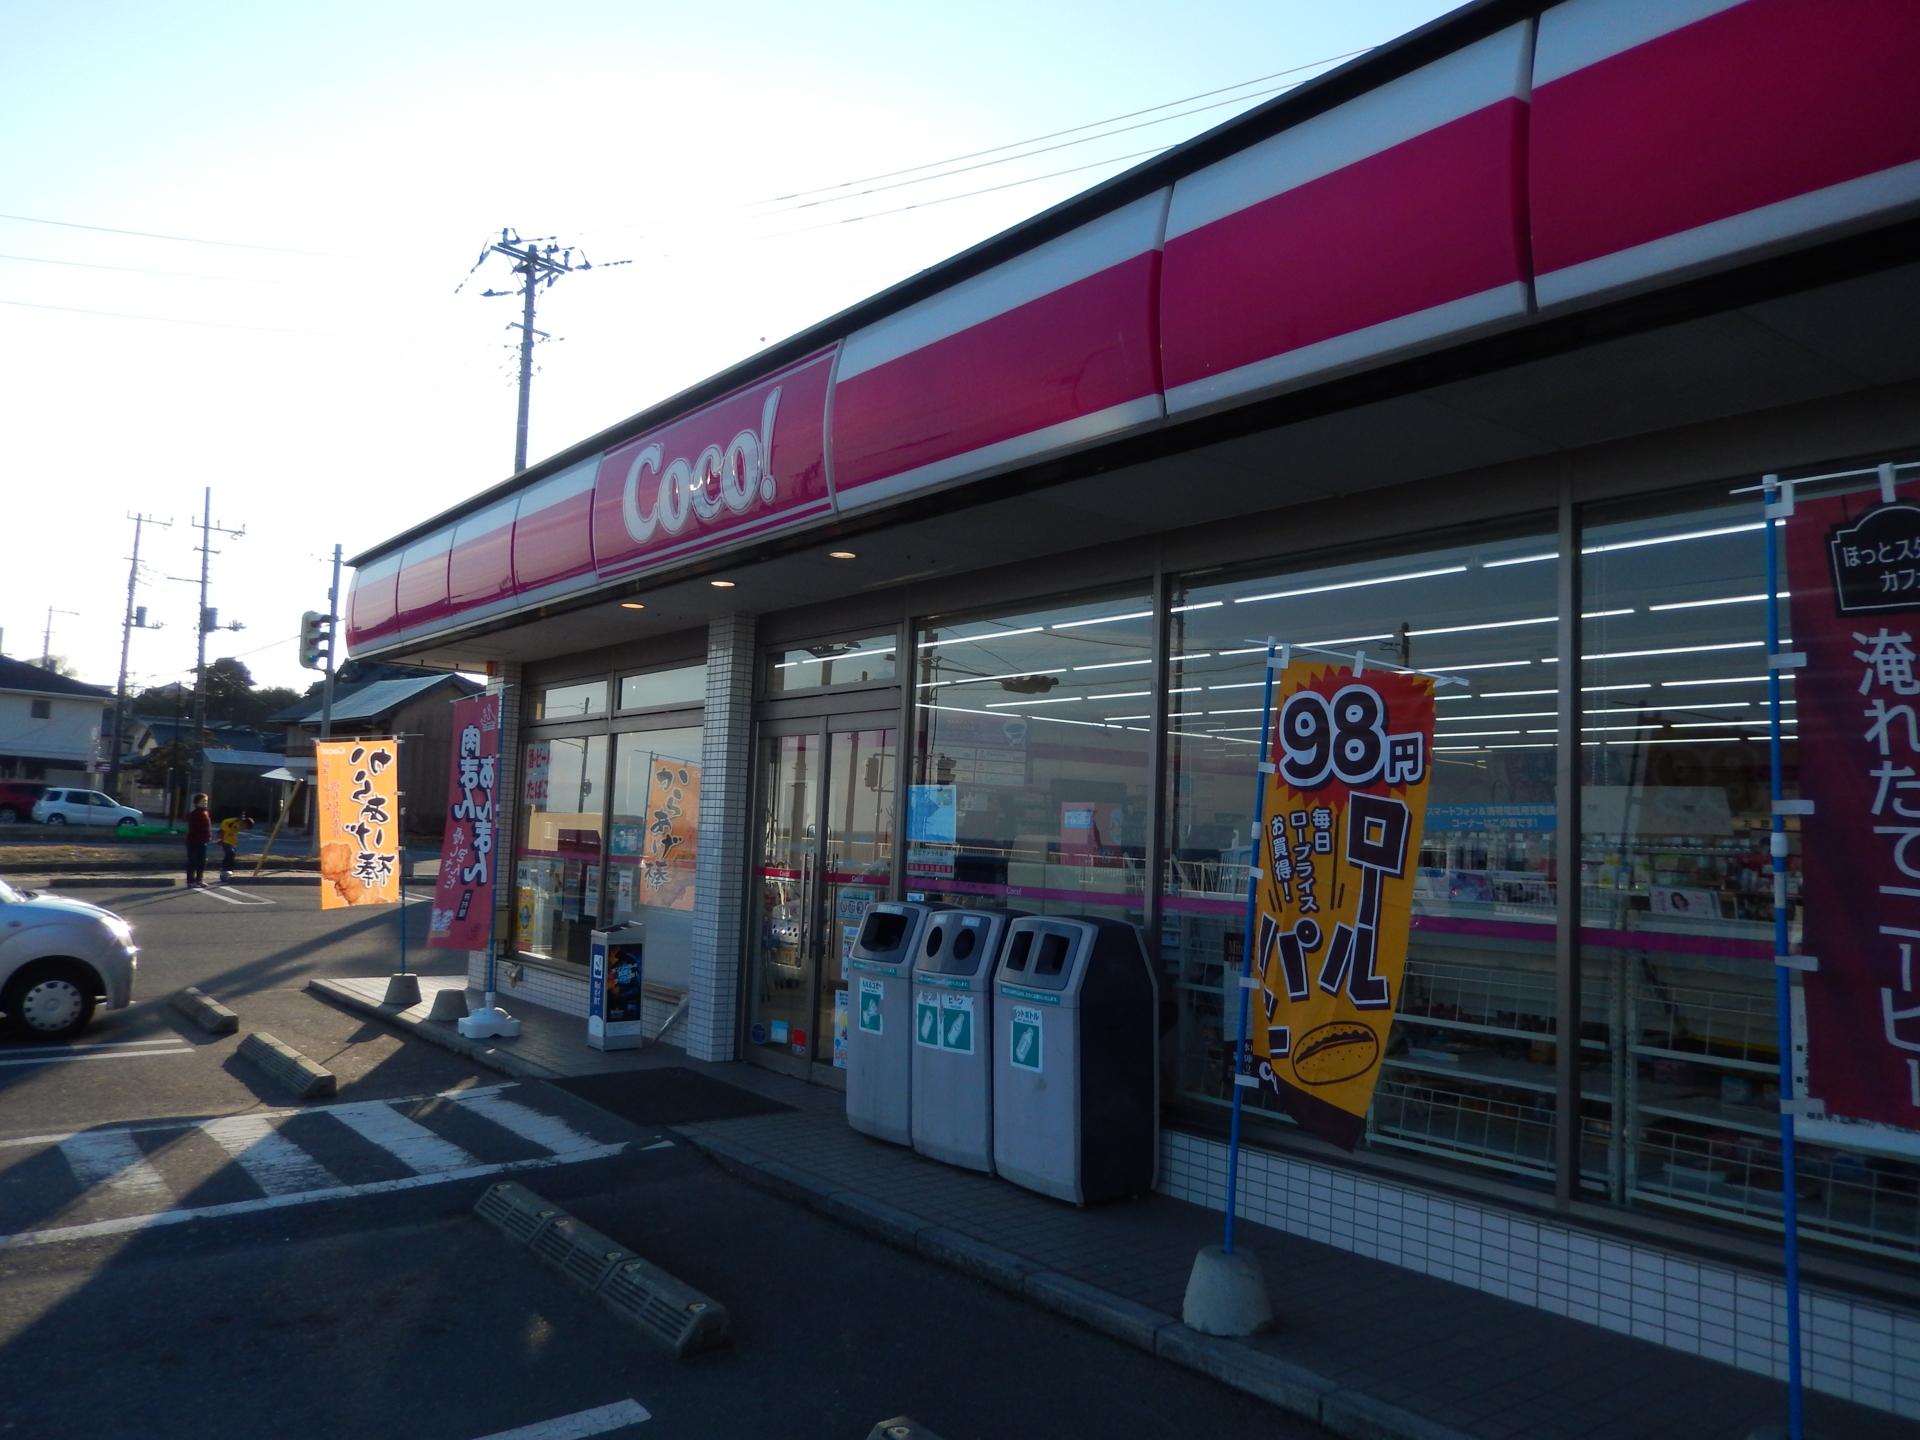 f:id:ToshUeno:20150227161944j:plain